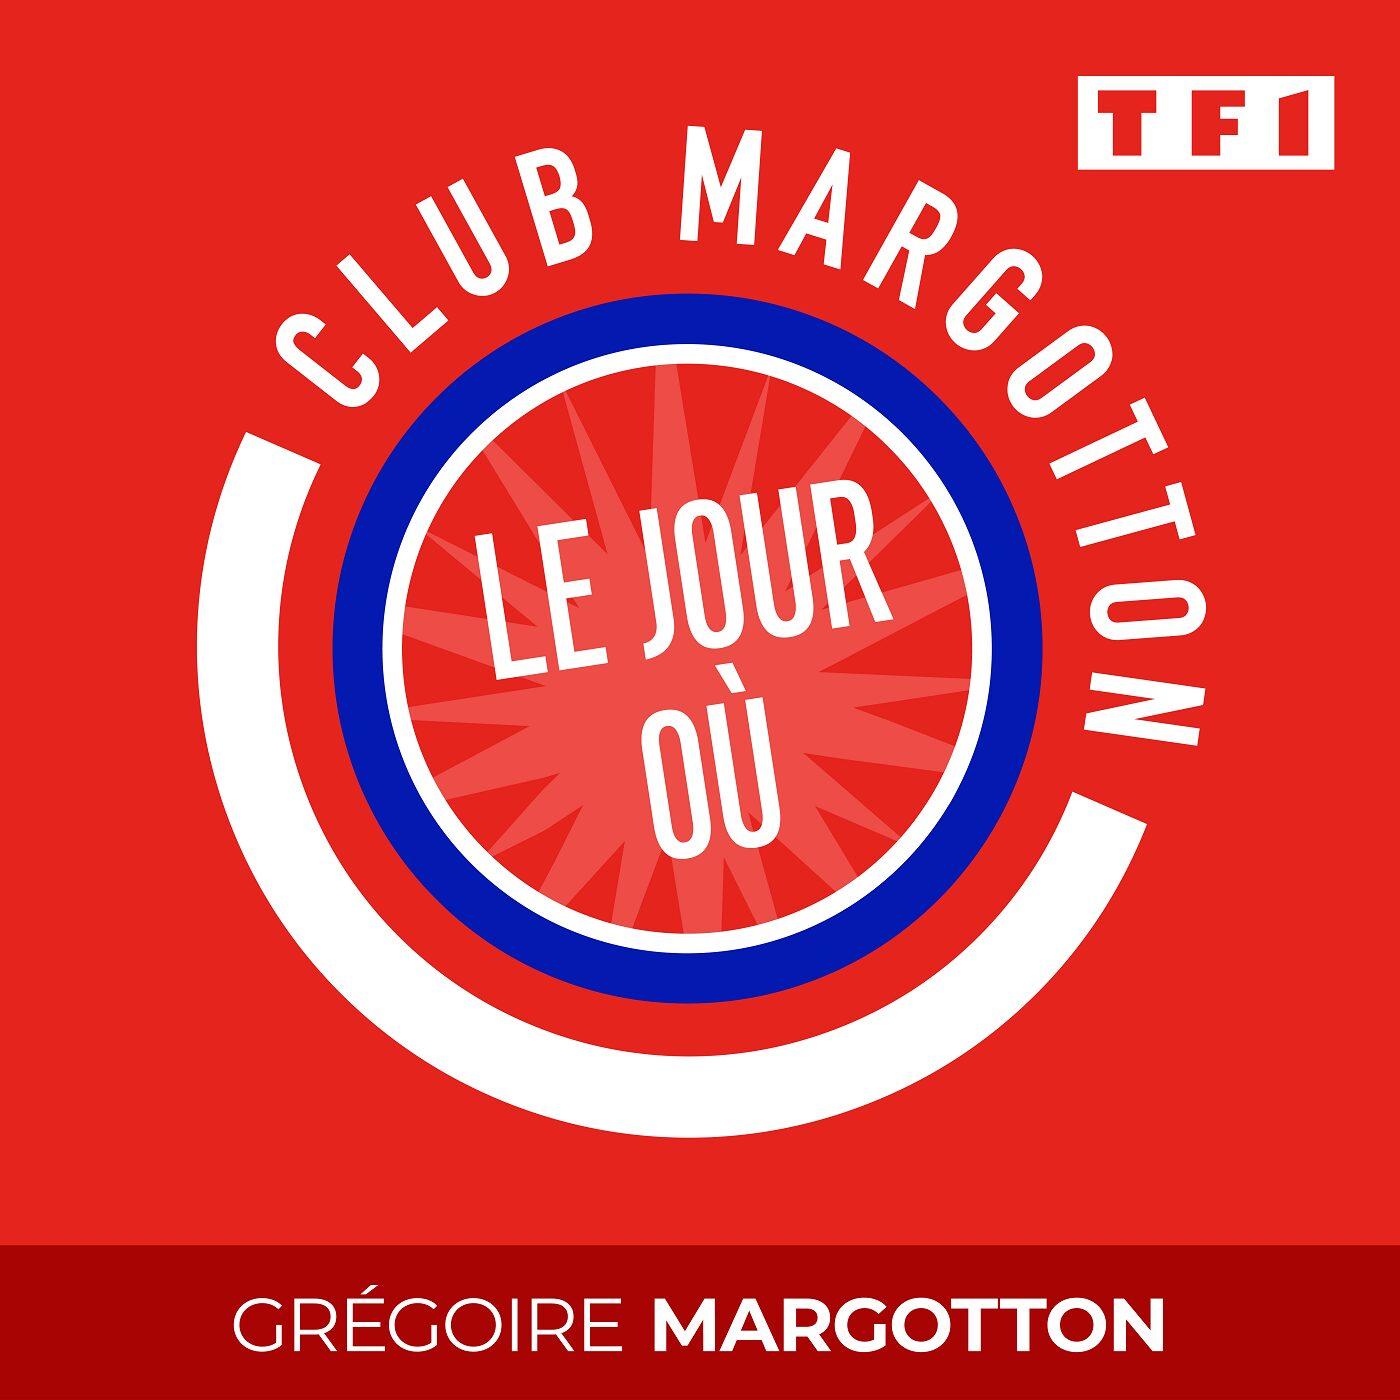 CLUB MARGOTTON - LE JOUR OÙ